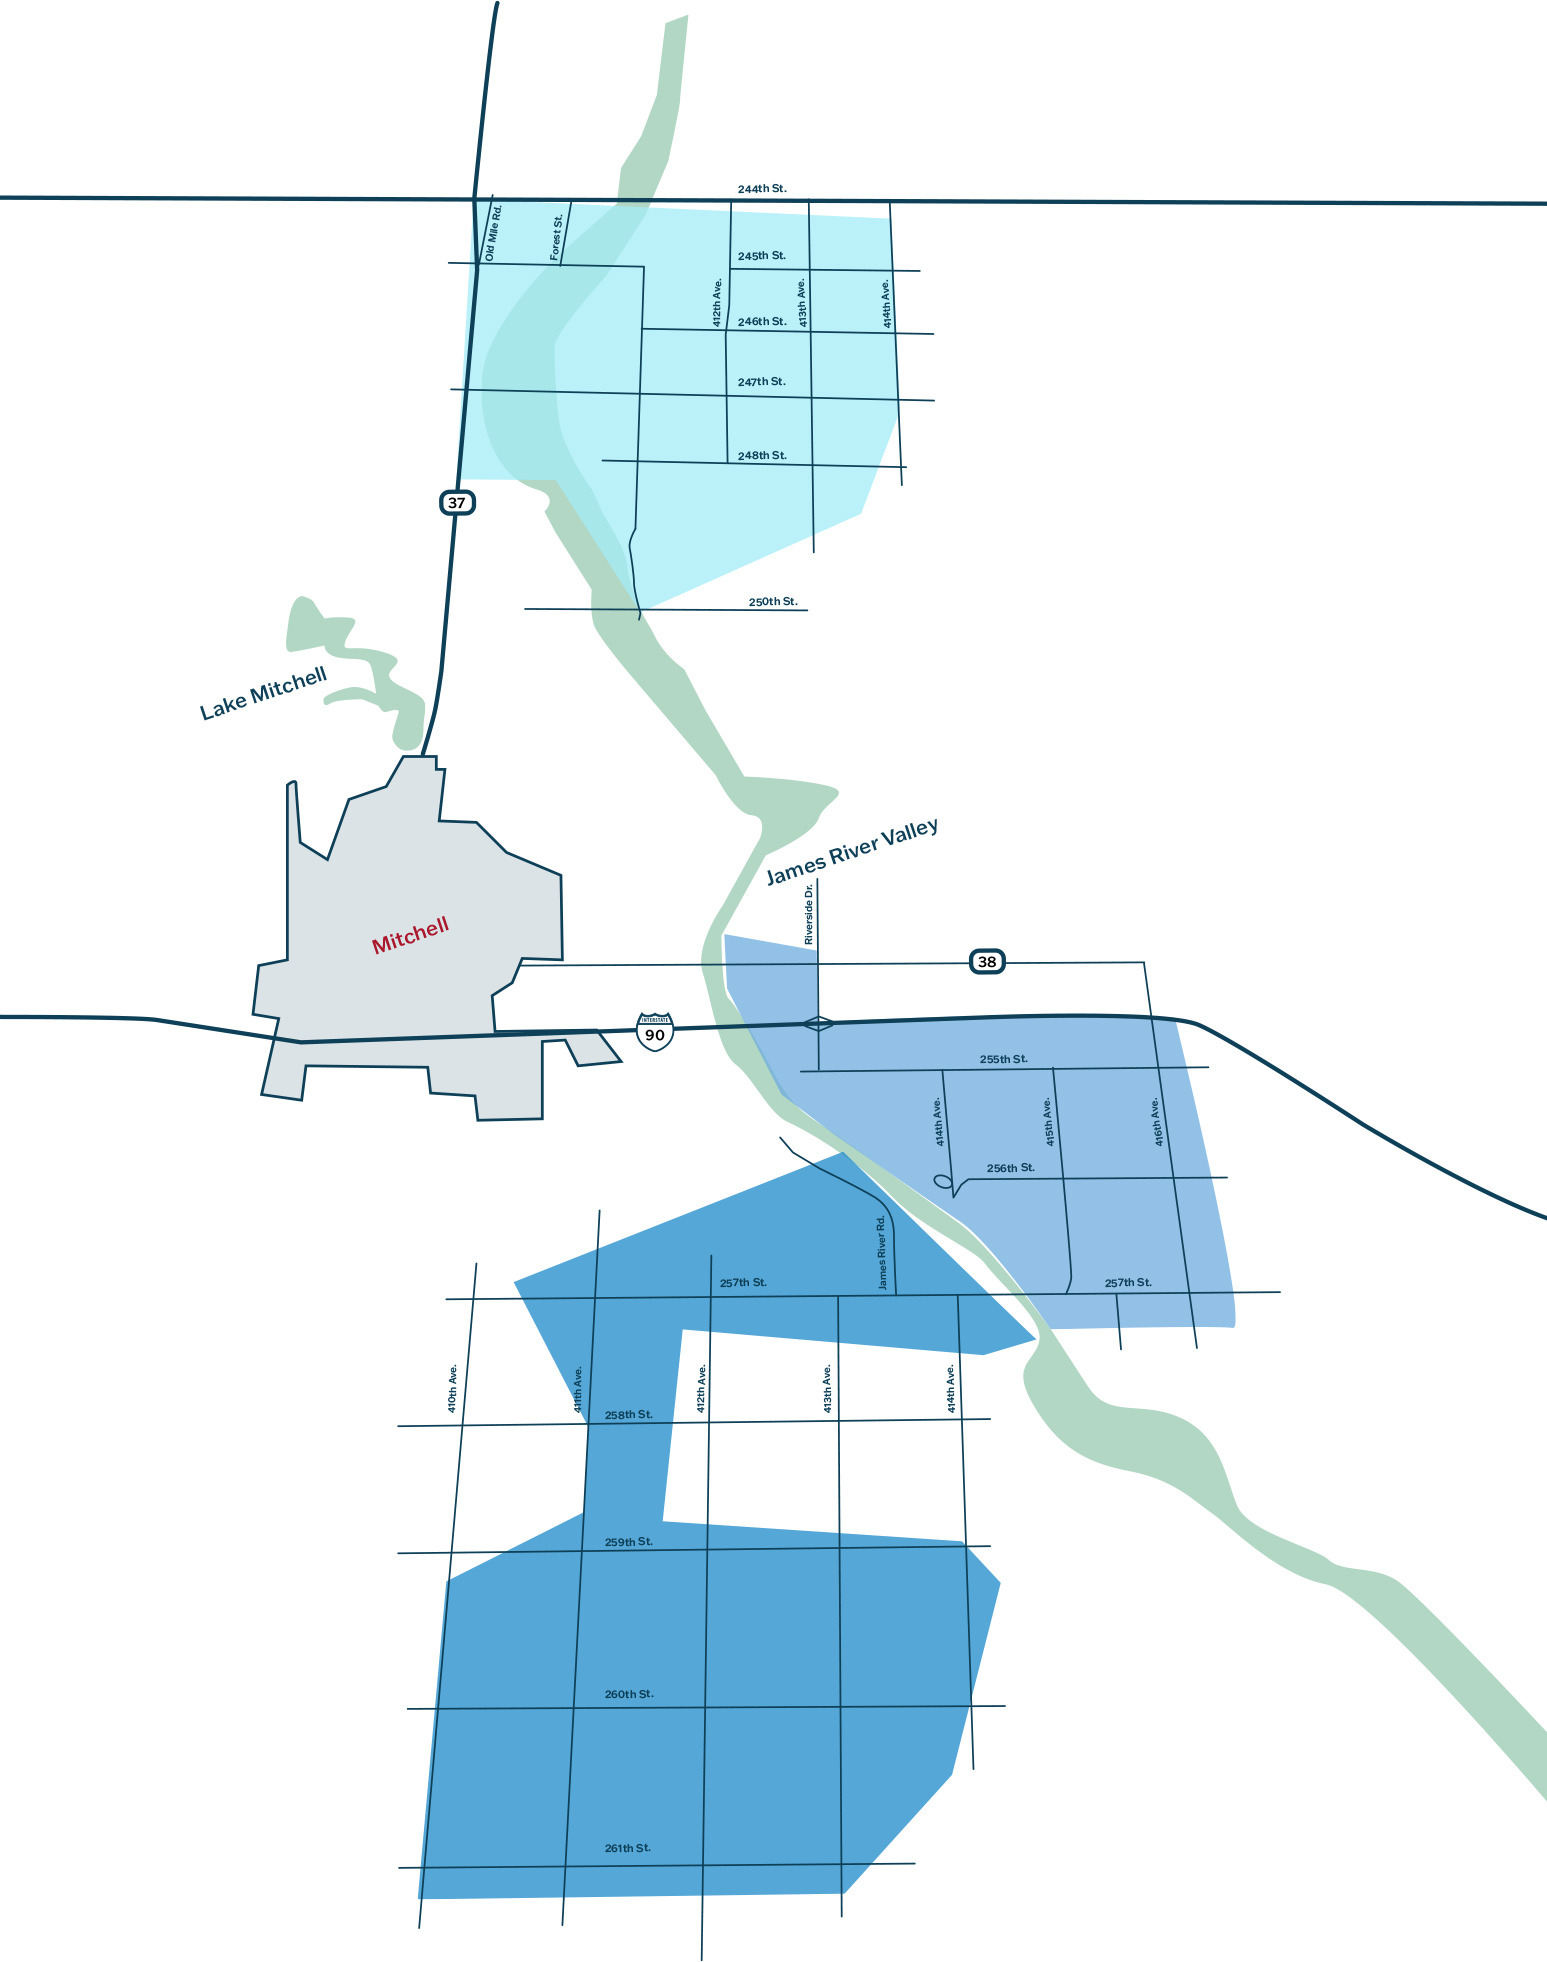 Mitchell map 3 zones of fiber build